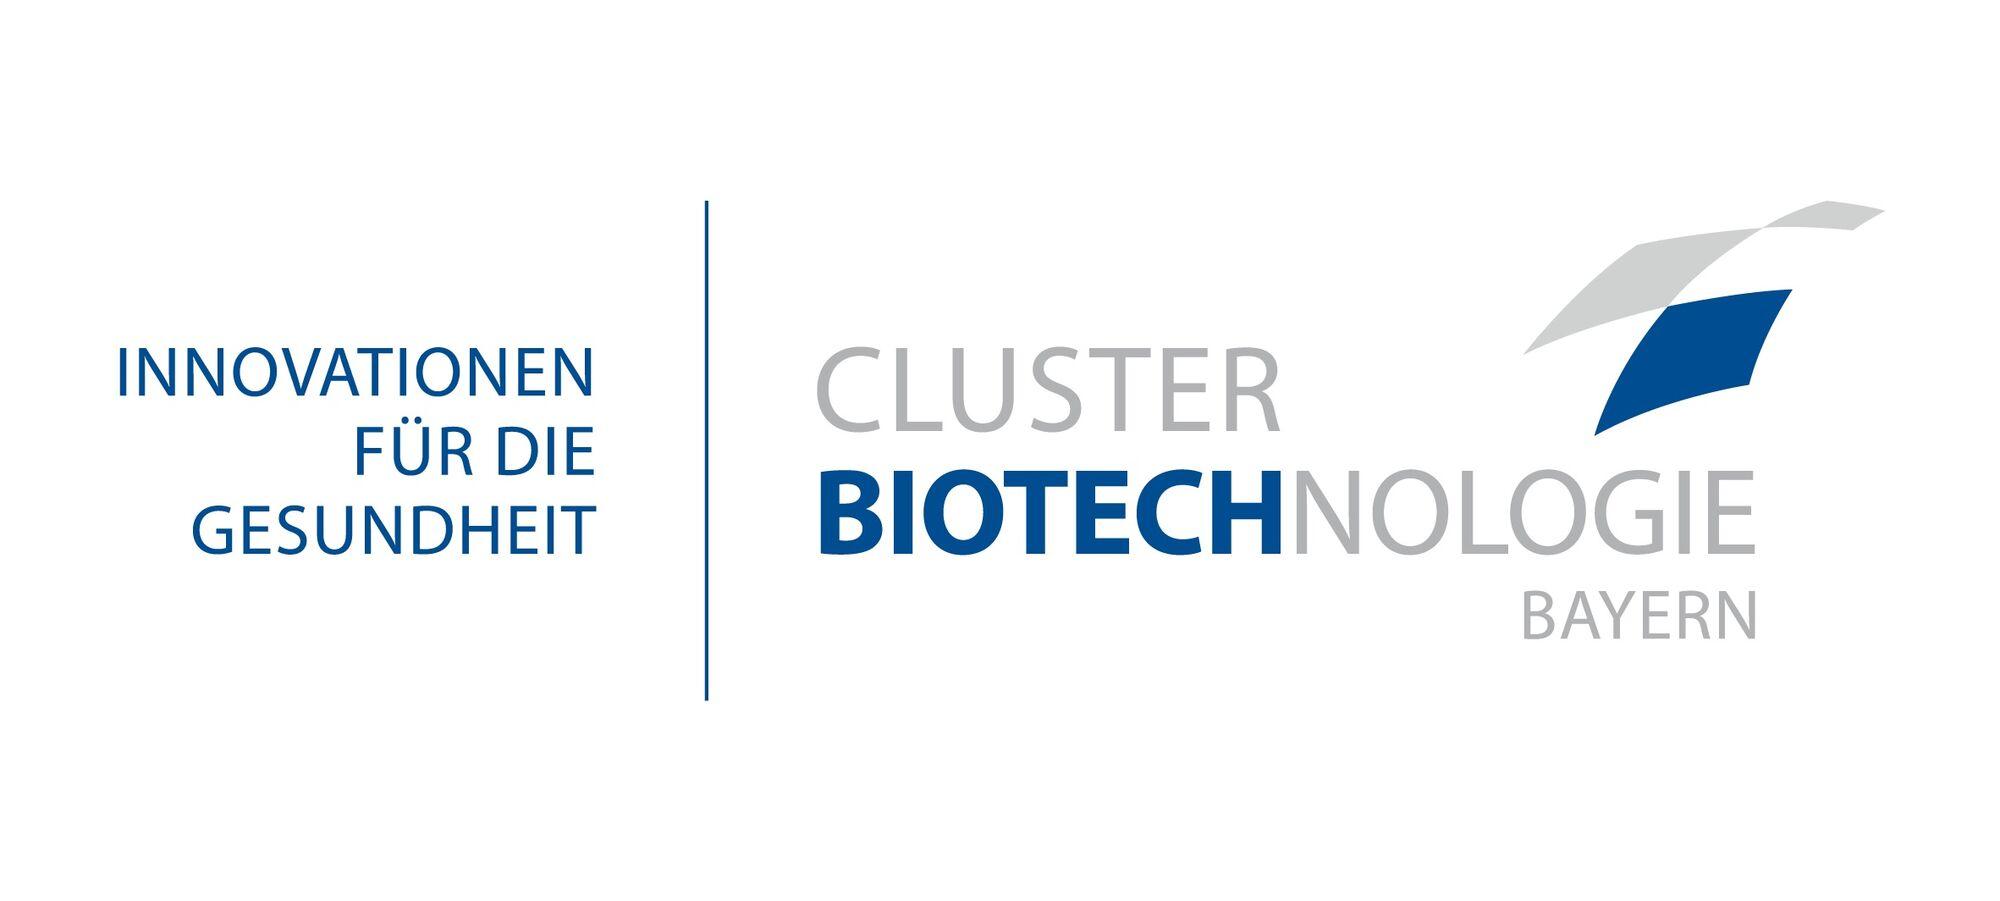 Biotechnologie bayern neues logo